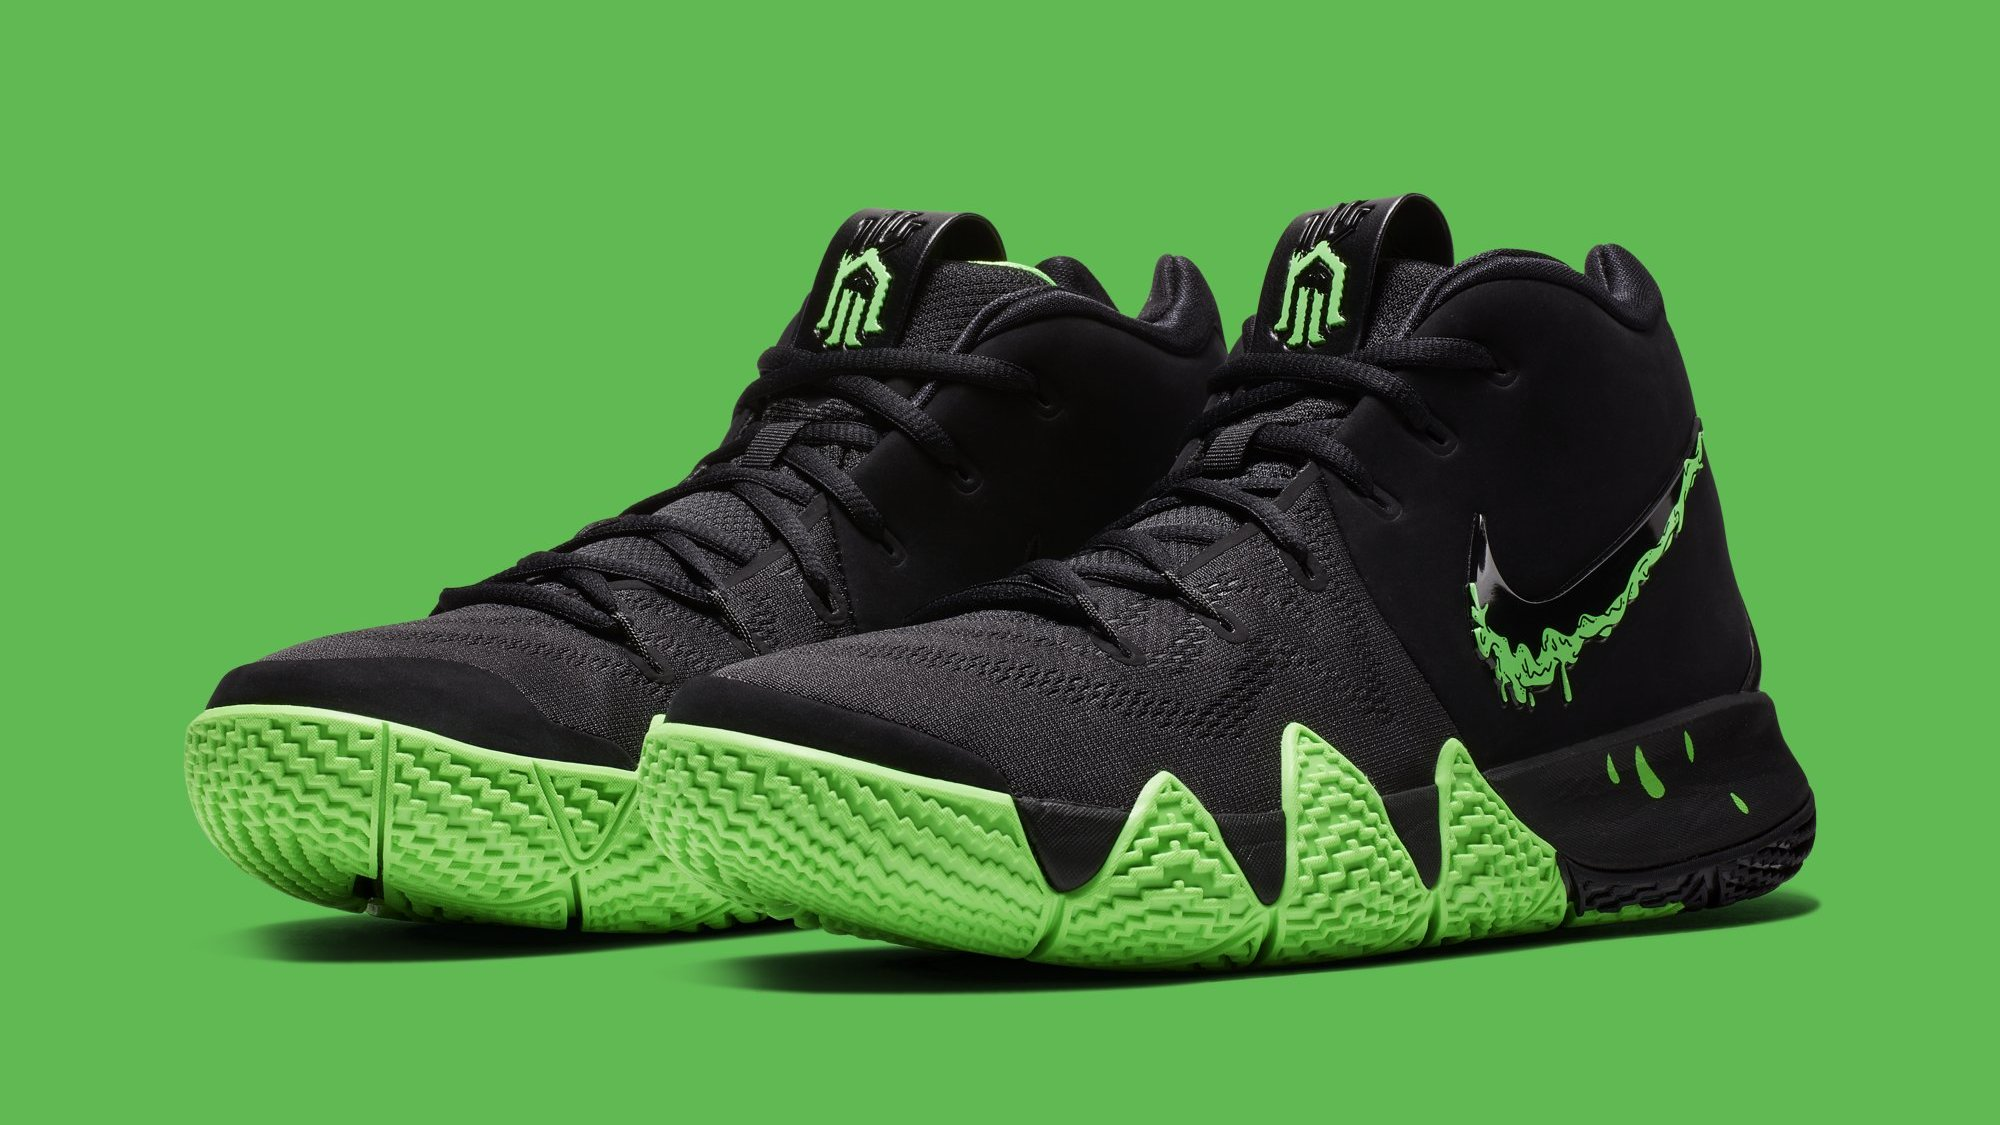 fdf2b6280cb2 Nike Kyrie 4 Black Rage Green Halloween Release Date 943806-012 ...